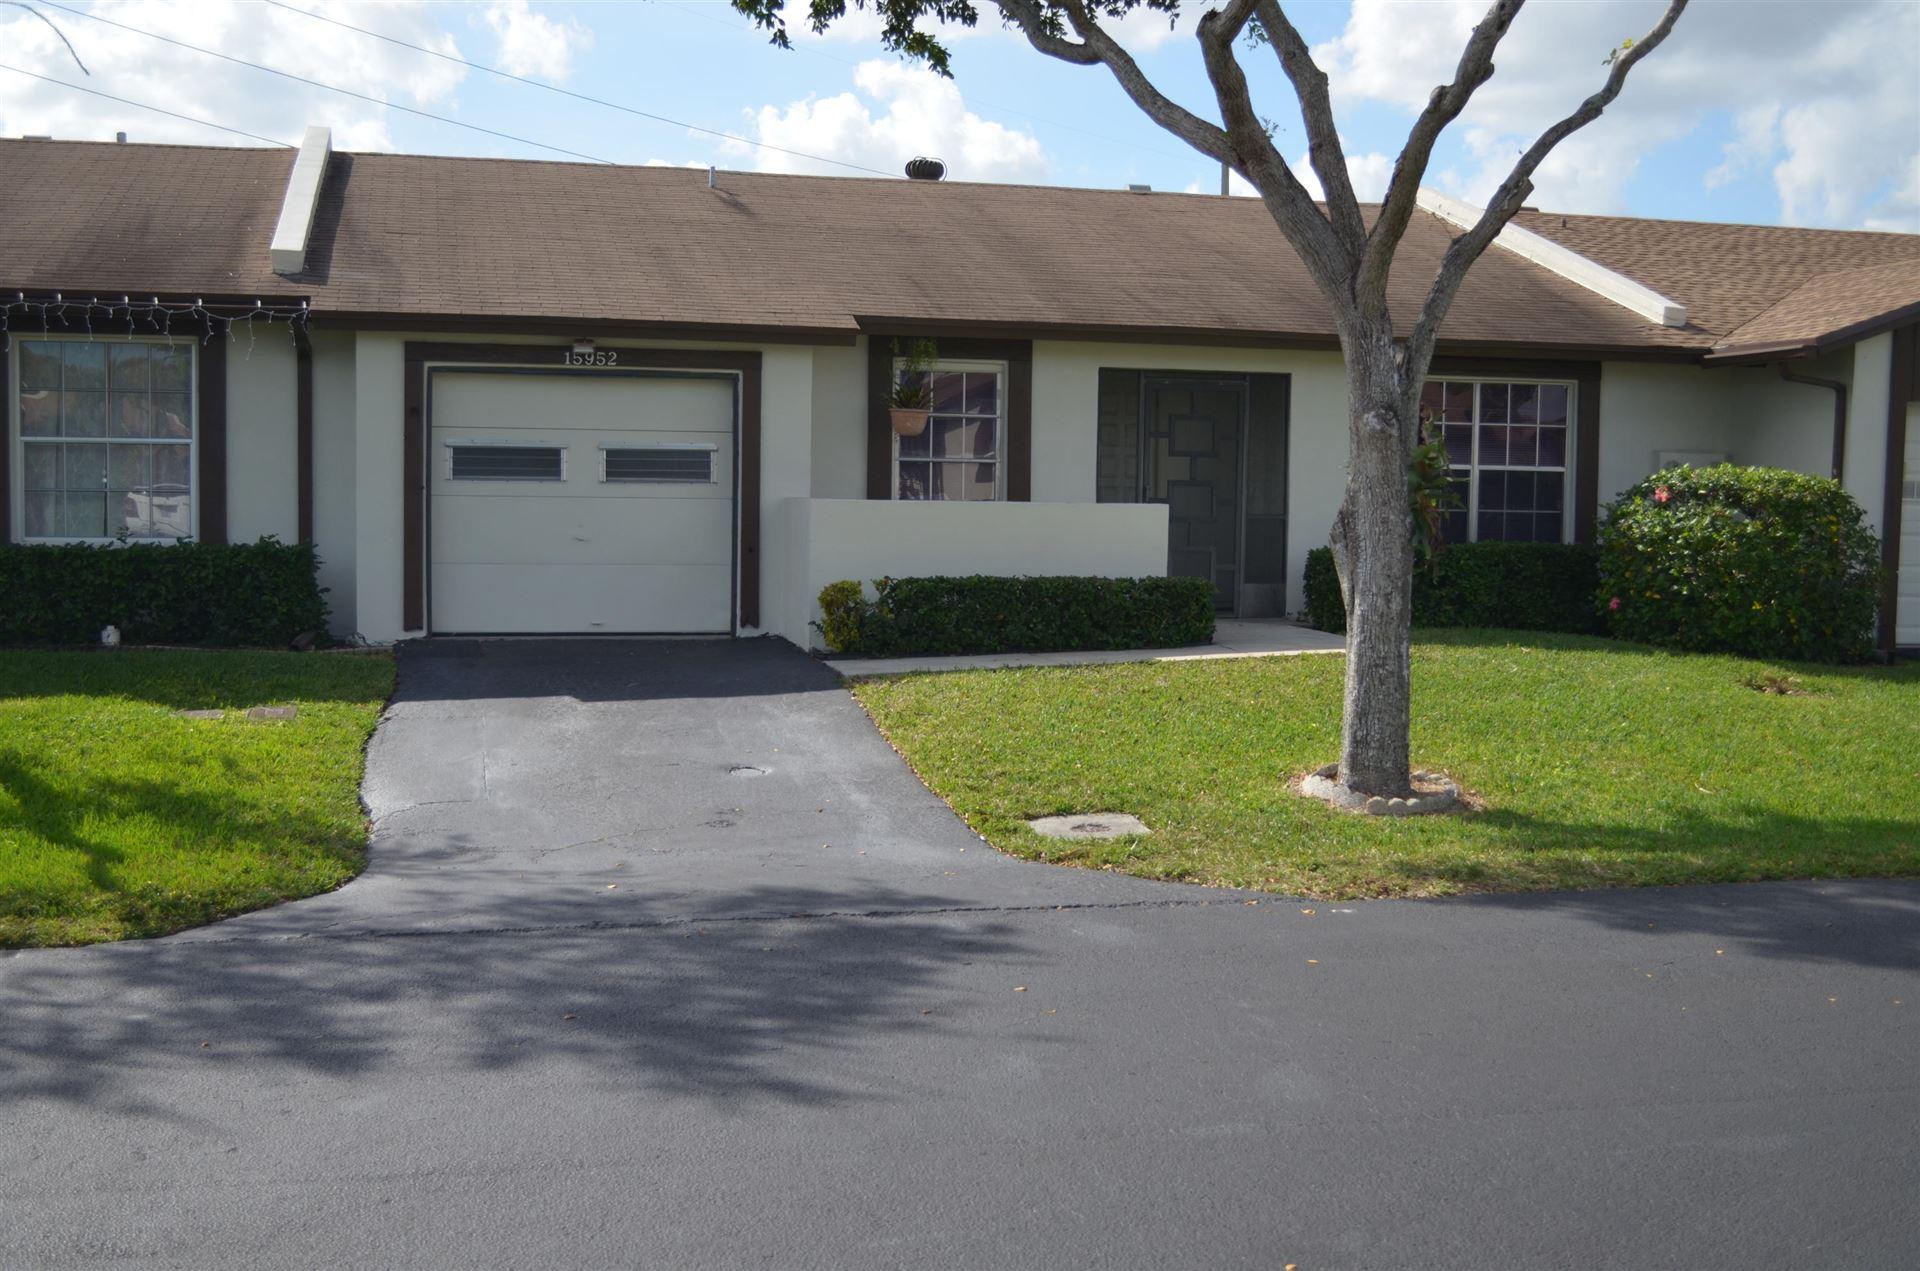 15952 Forsythia Circle, Delray Beach, FL 33484 - MLS#: RX-10634798